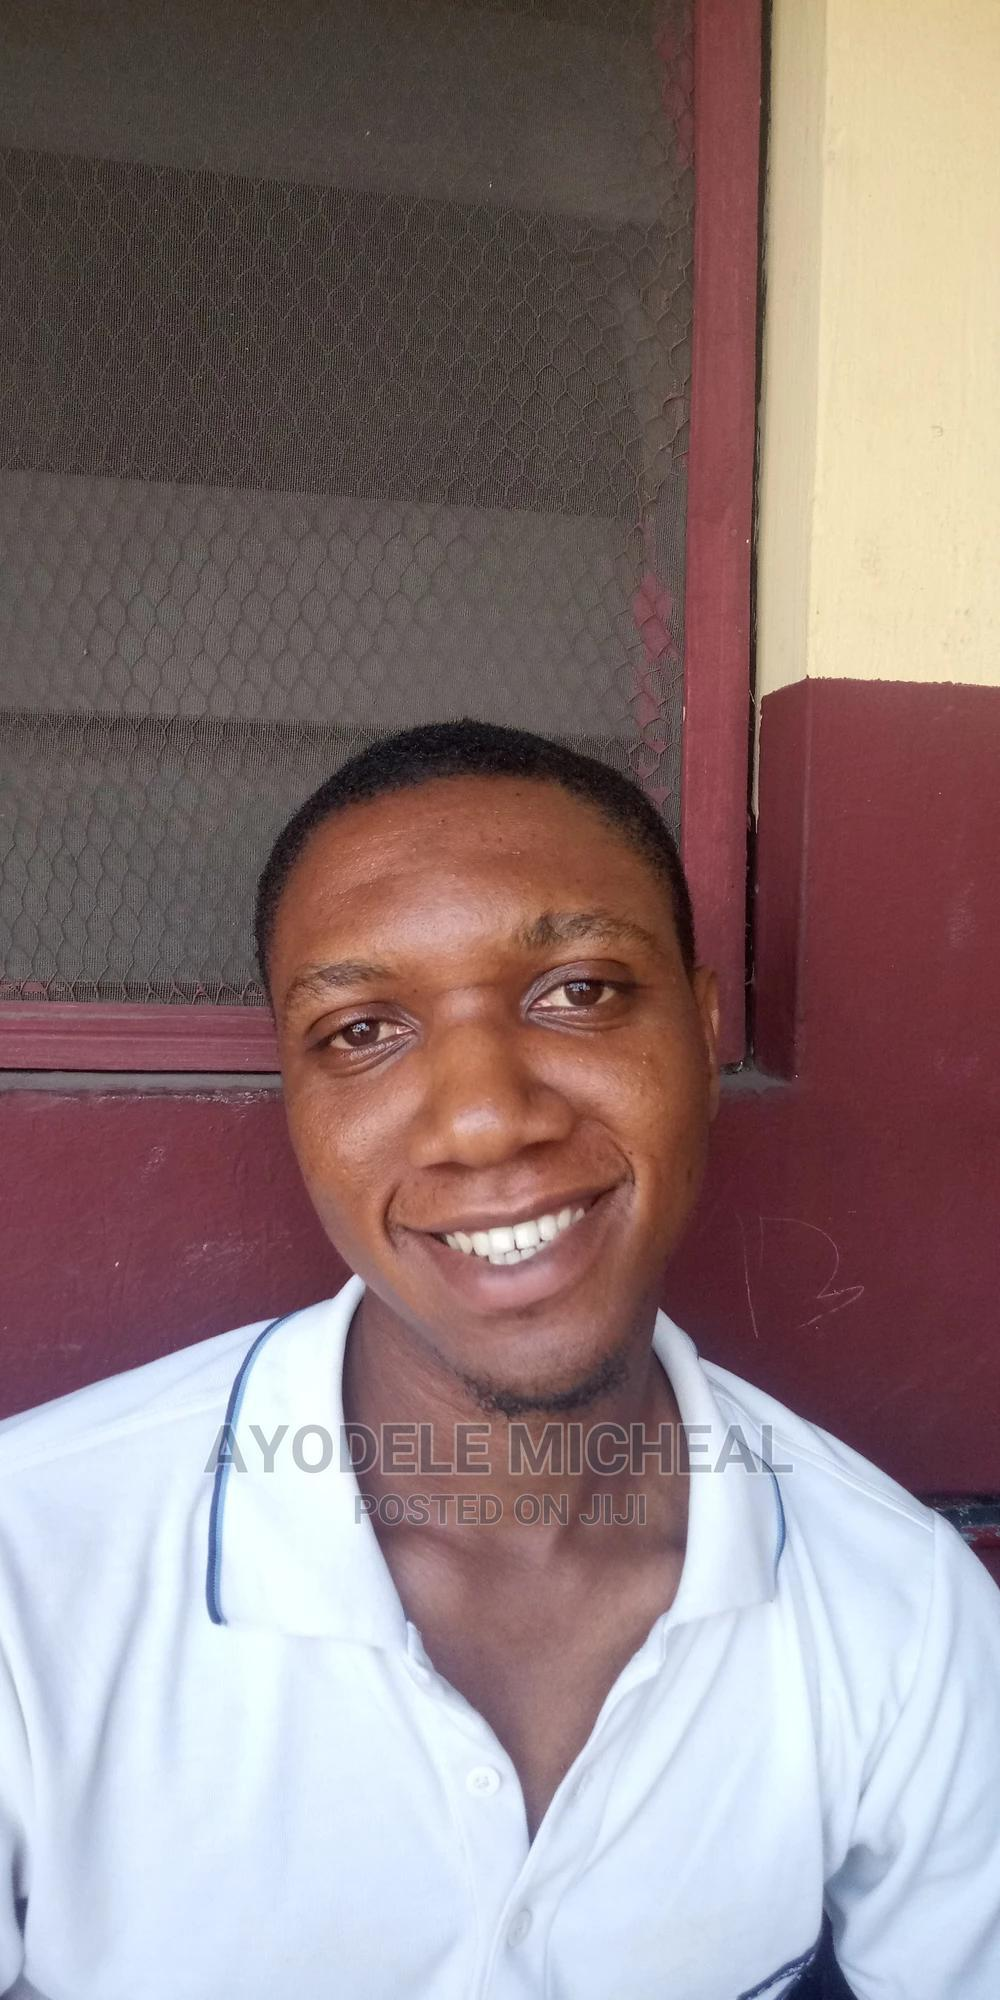 Mr. Ayodele